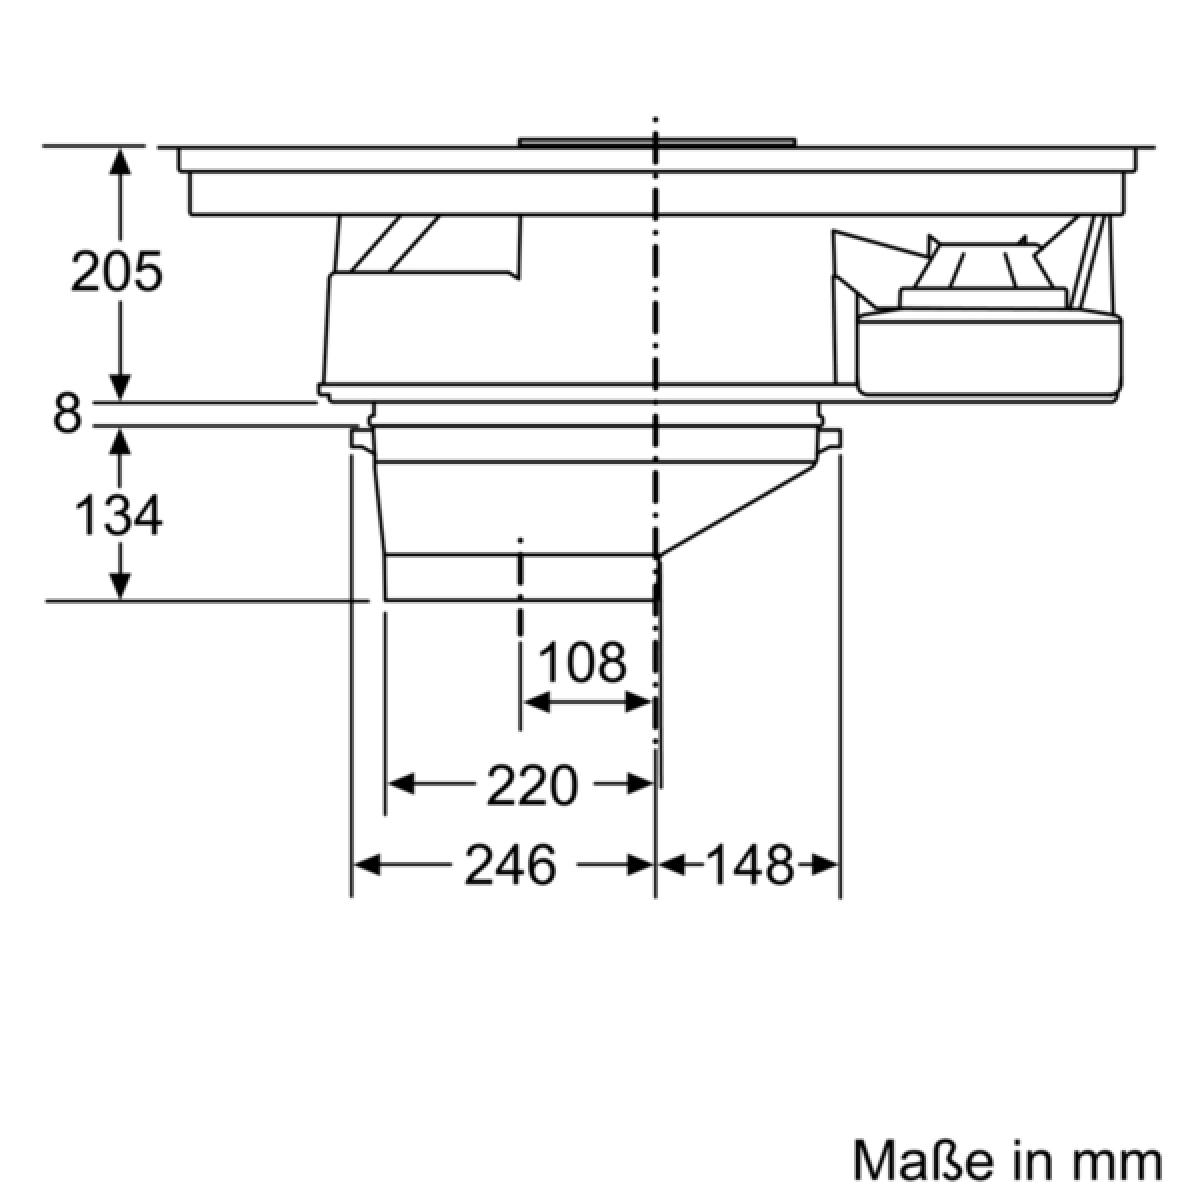 siemens ex875lx34e induktions kochfeld mit integriertem dunstabzug 80 cm induktions kochstelle. Black Bedroom Furniture Sets. Home Design Ideas